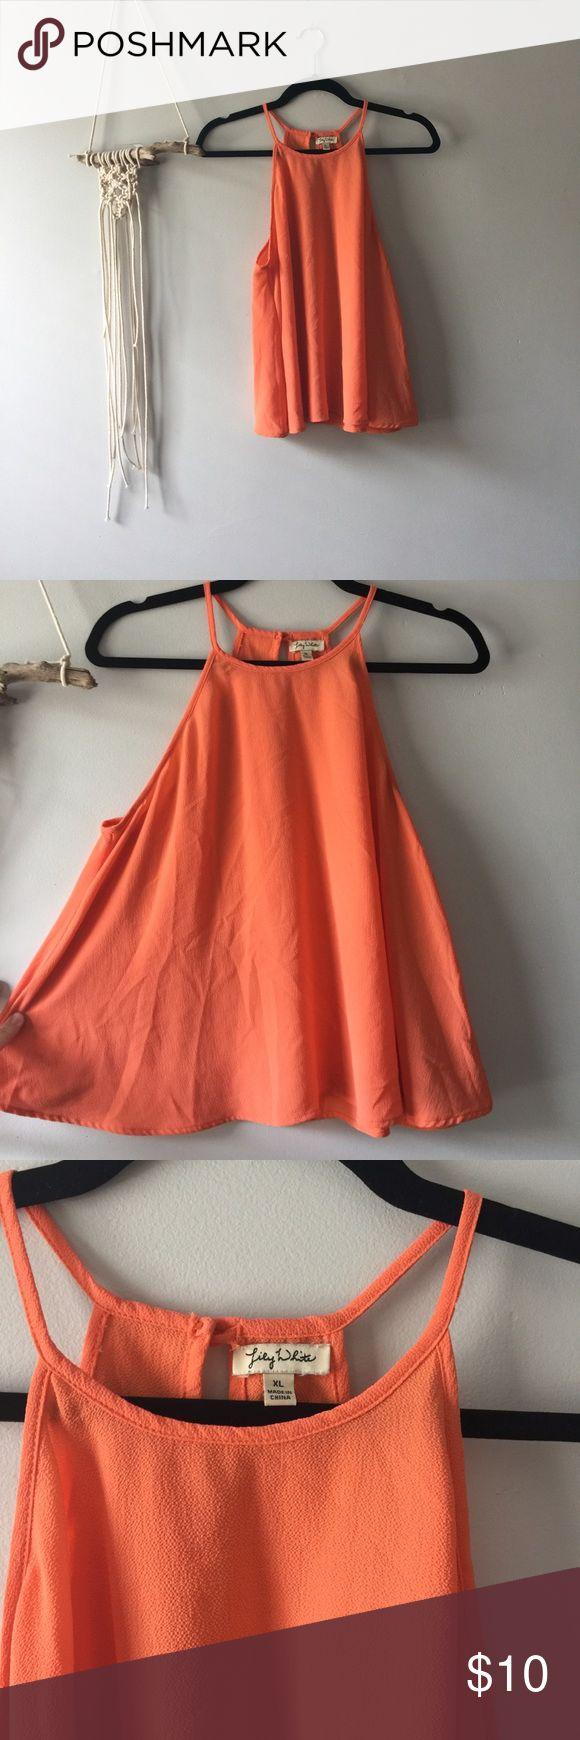 Orange Swingy high neck cami Lightweight orange cami Tops Camisoles